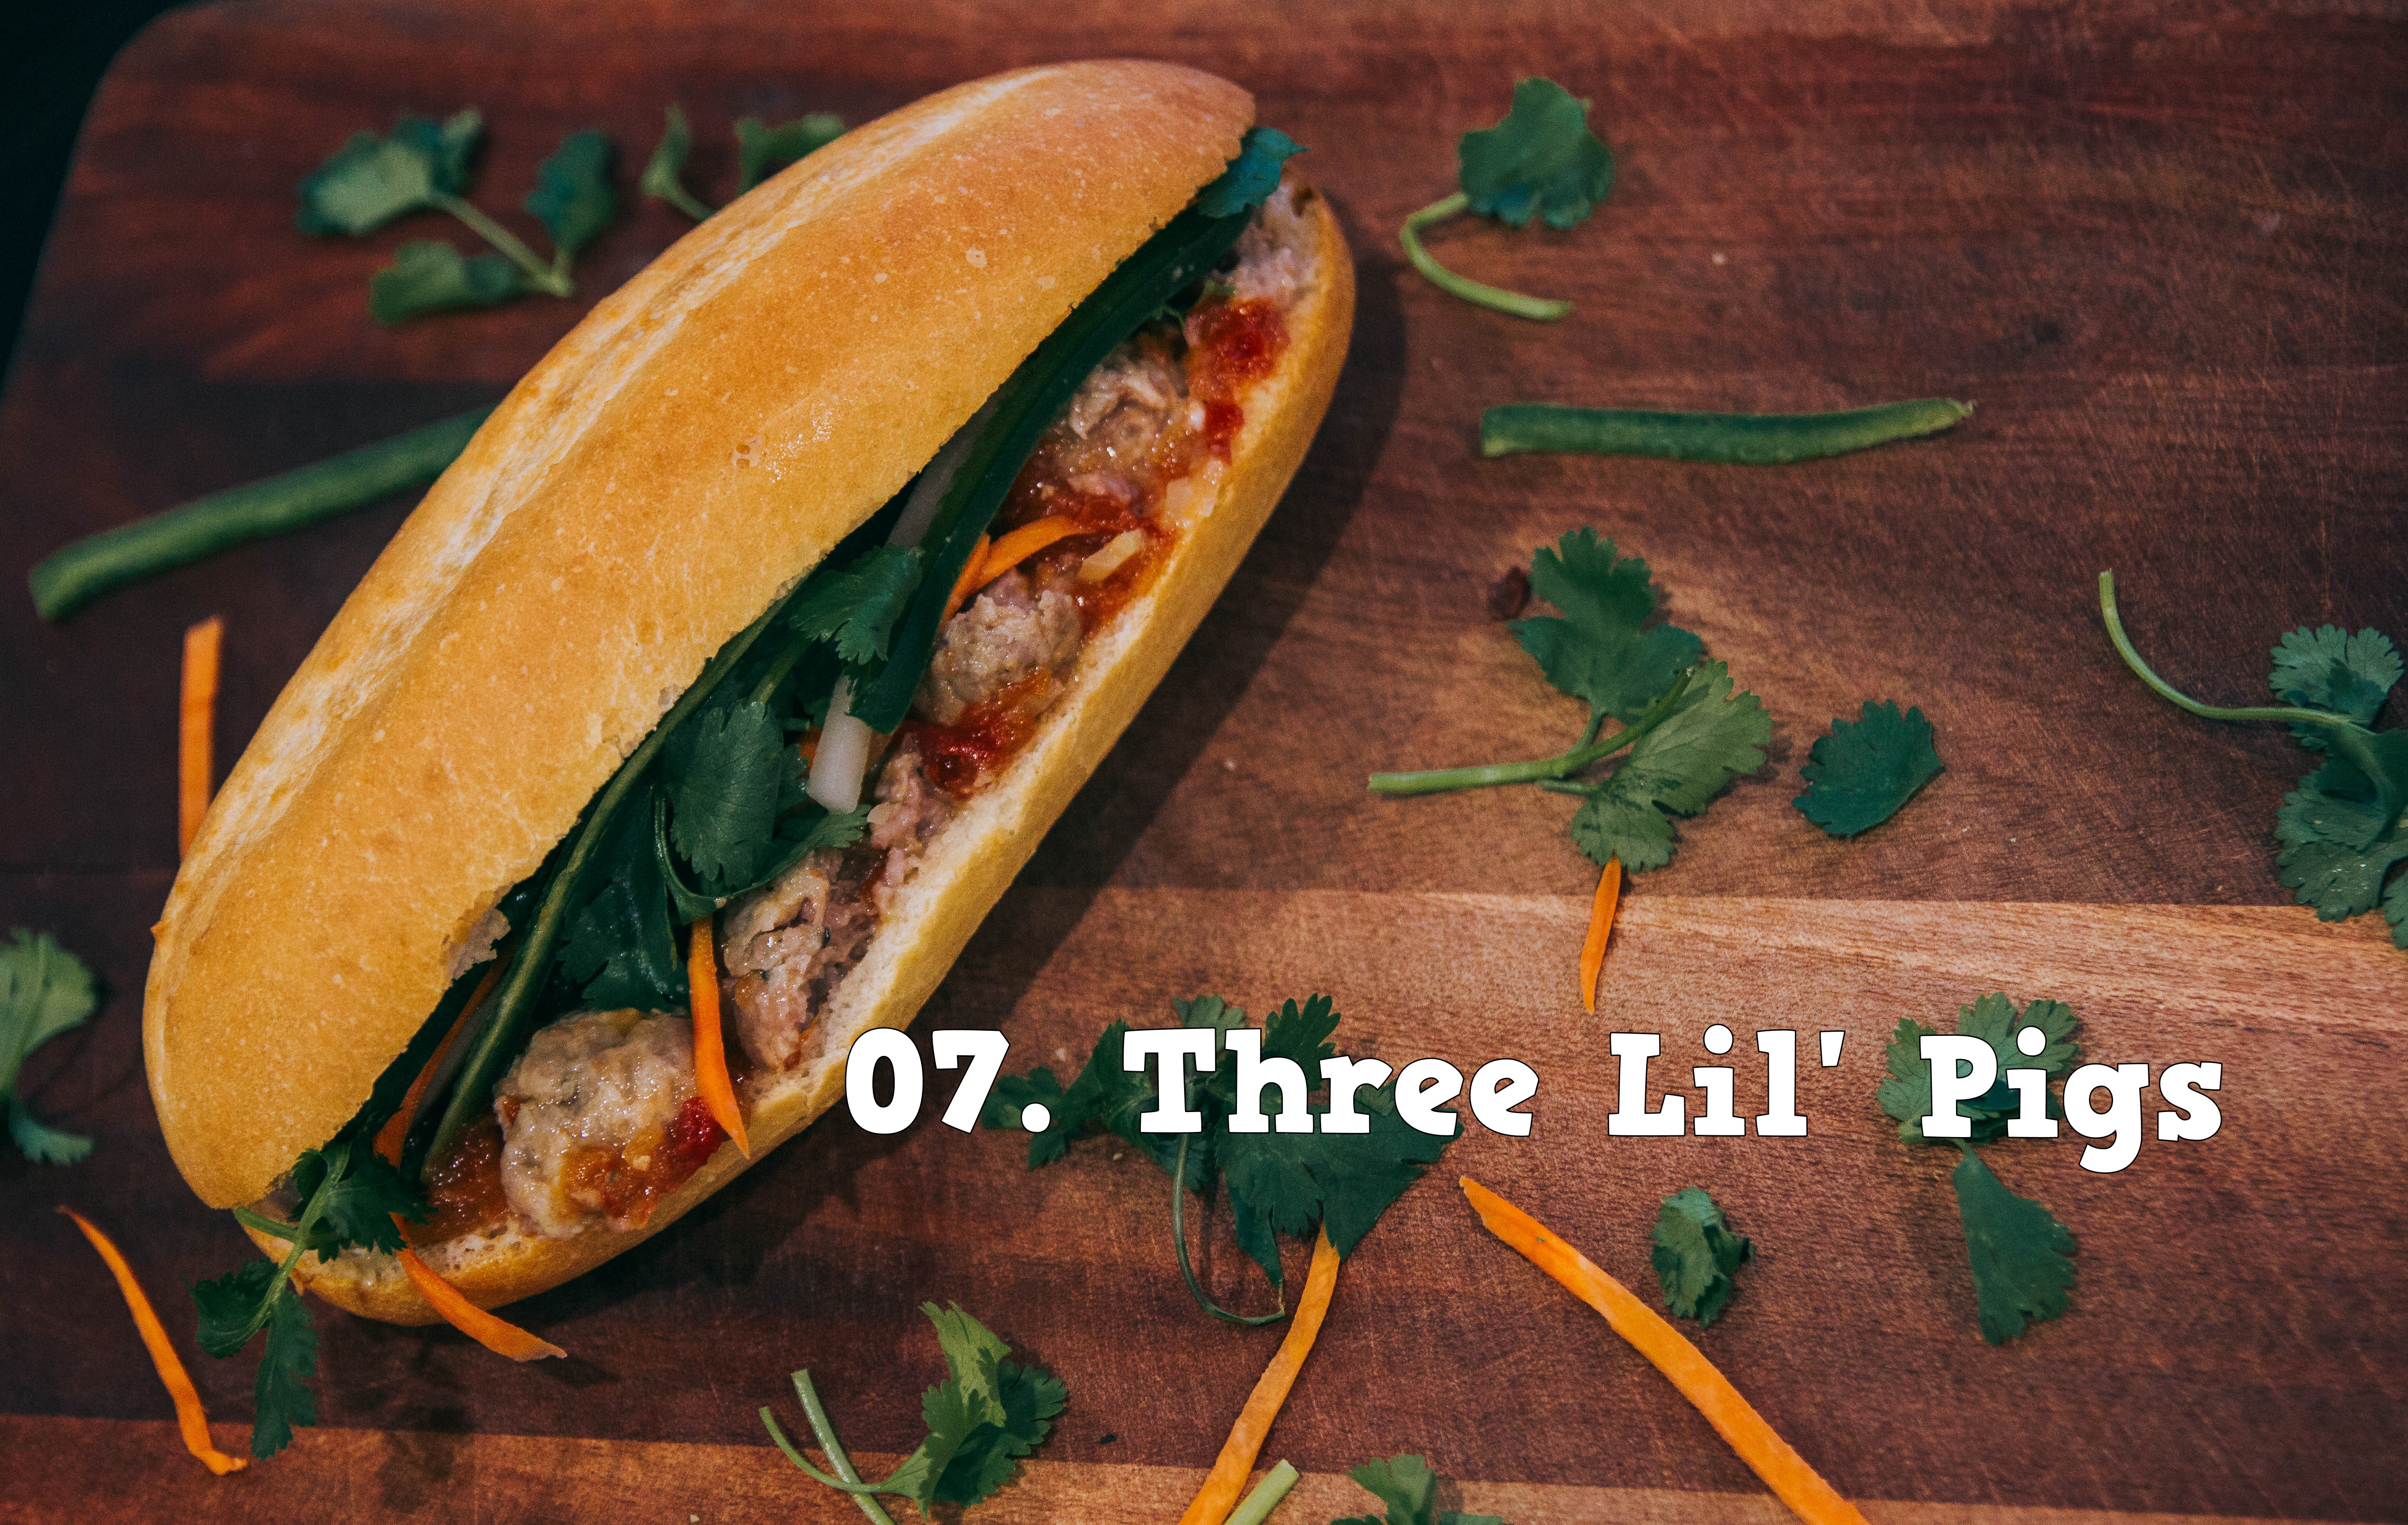 07.Three Lil' Pigs Image